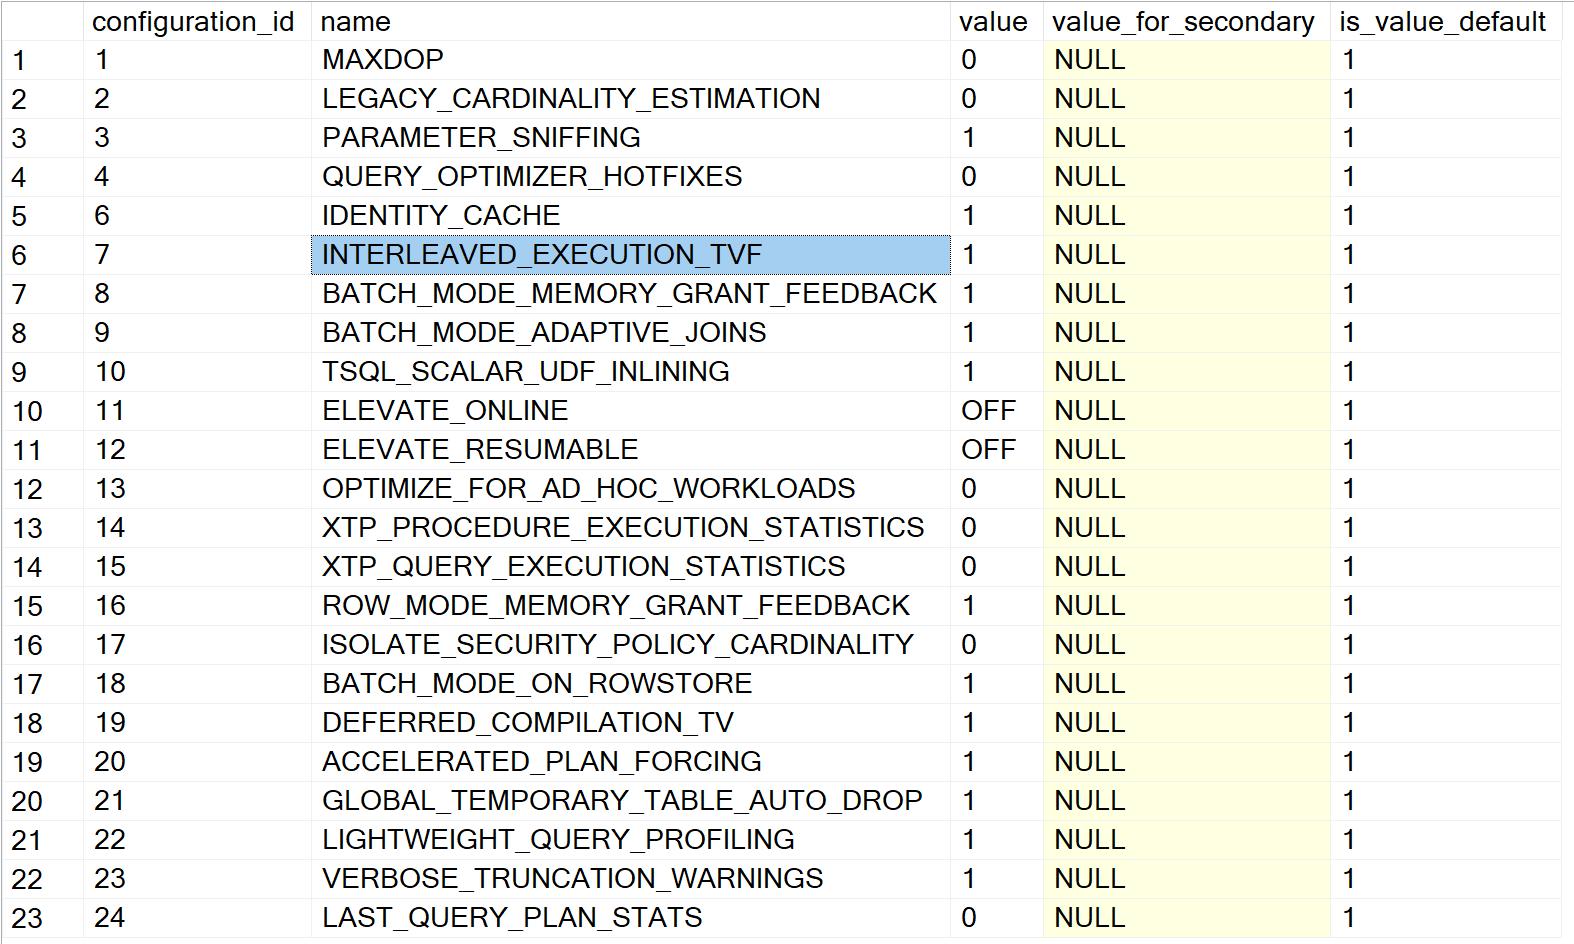 SQL SERVER - Database Scoped Configurations scopedconfiguration2019